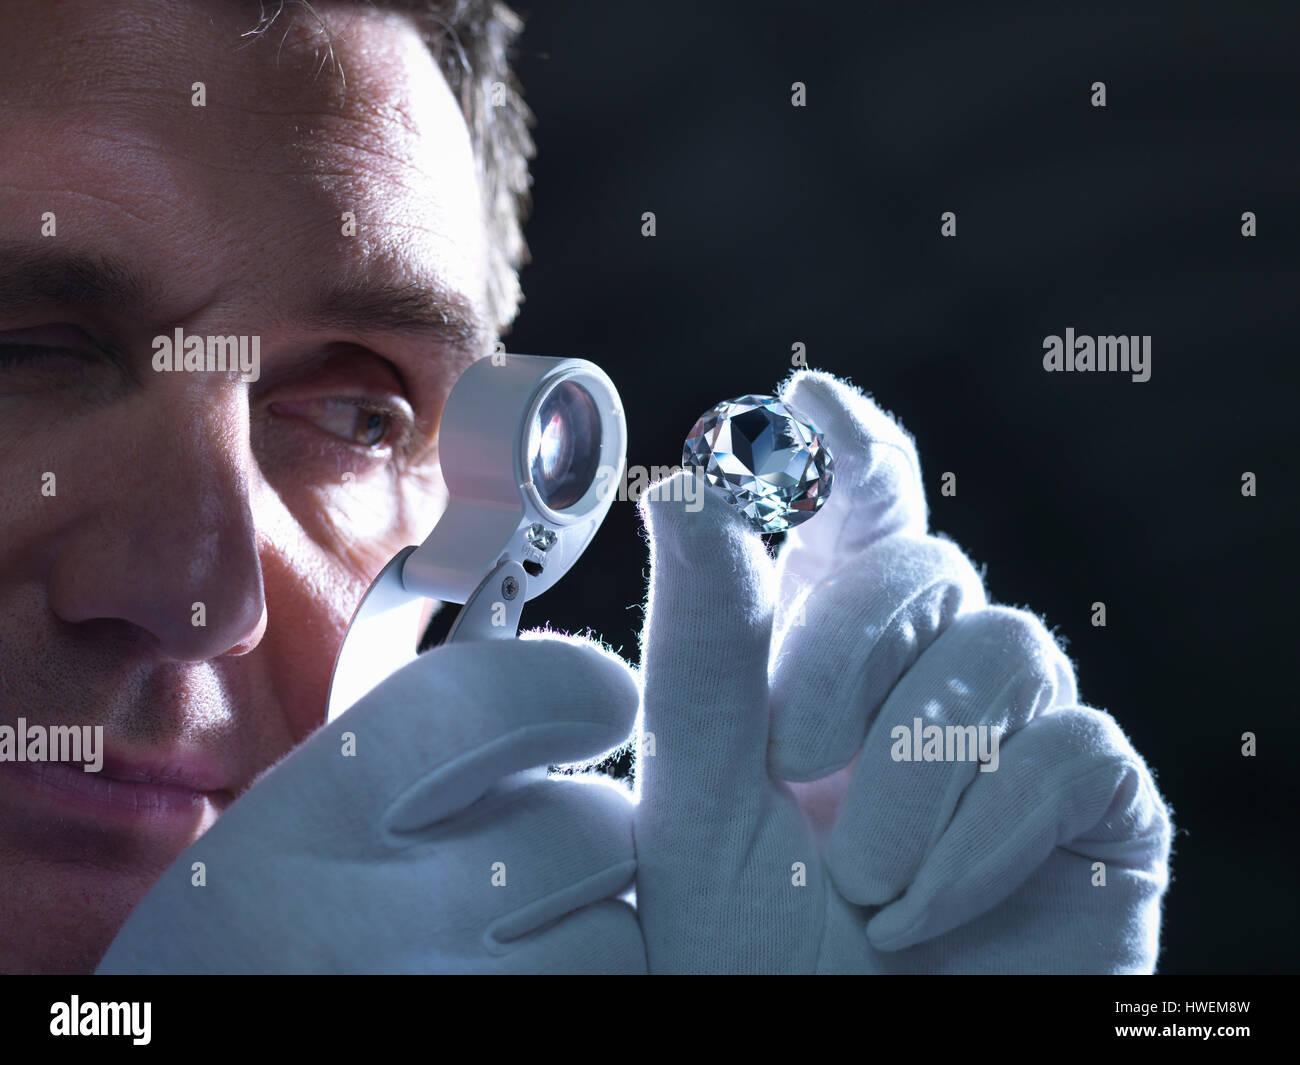 Jeweller inspecting replica diamonds with loupe - Stock Image